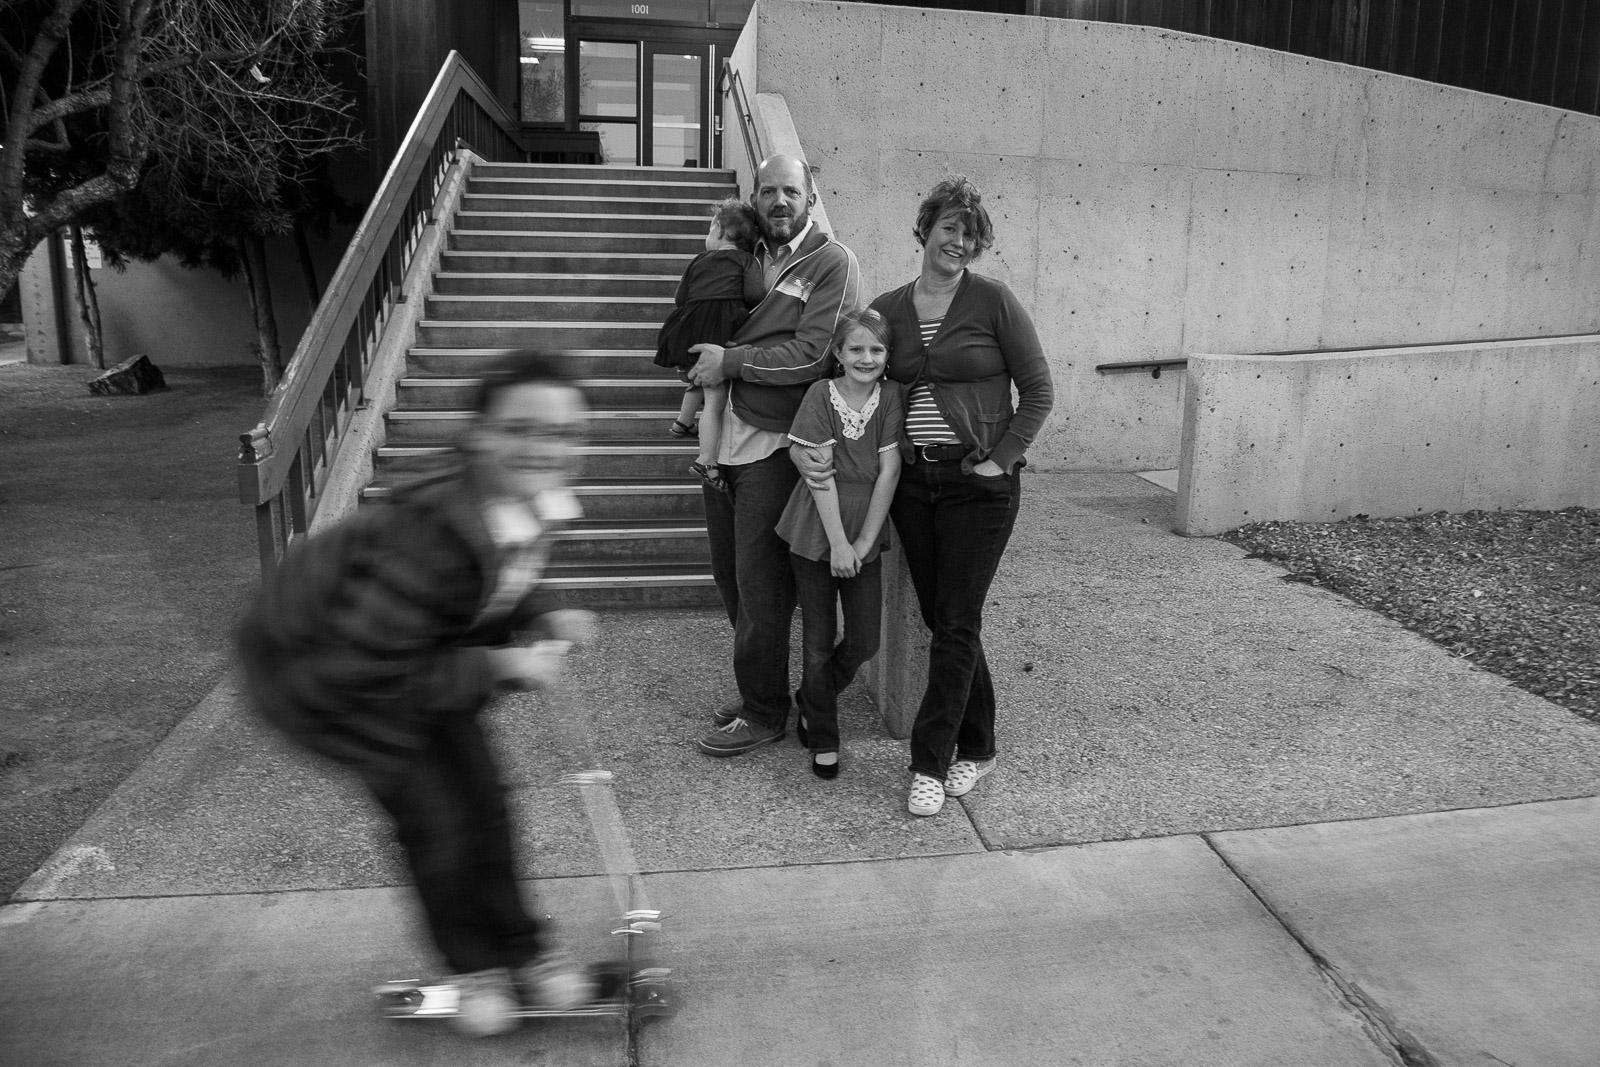 las-vegas-family-portrait-photography-4608.jpg